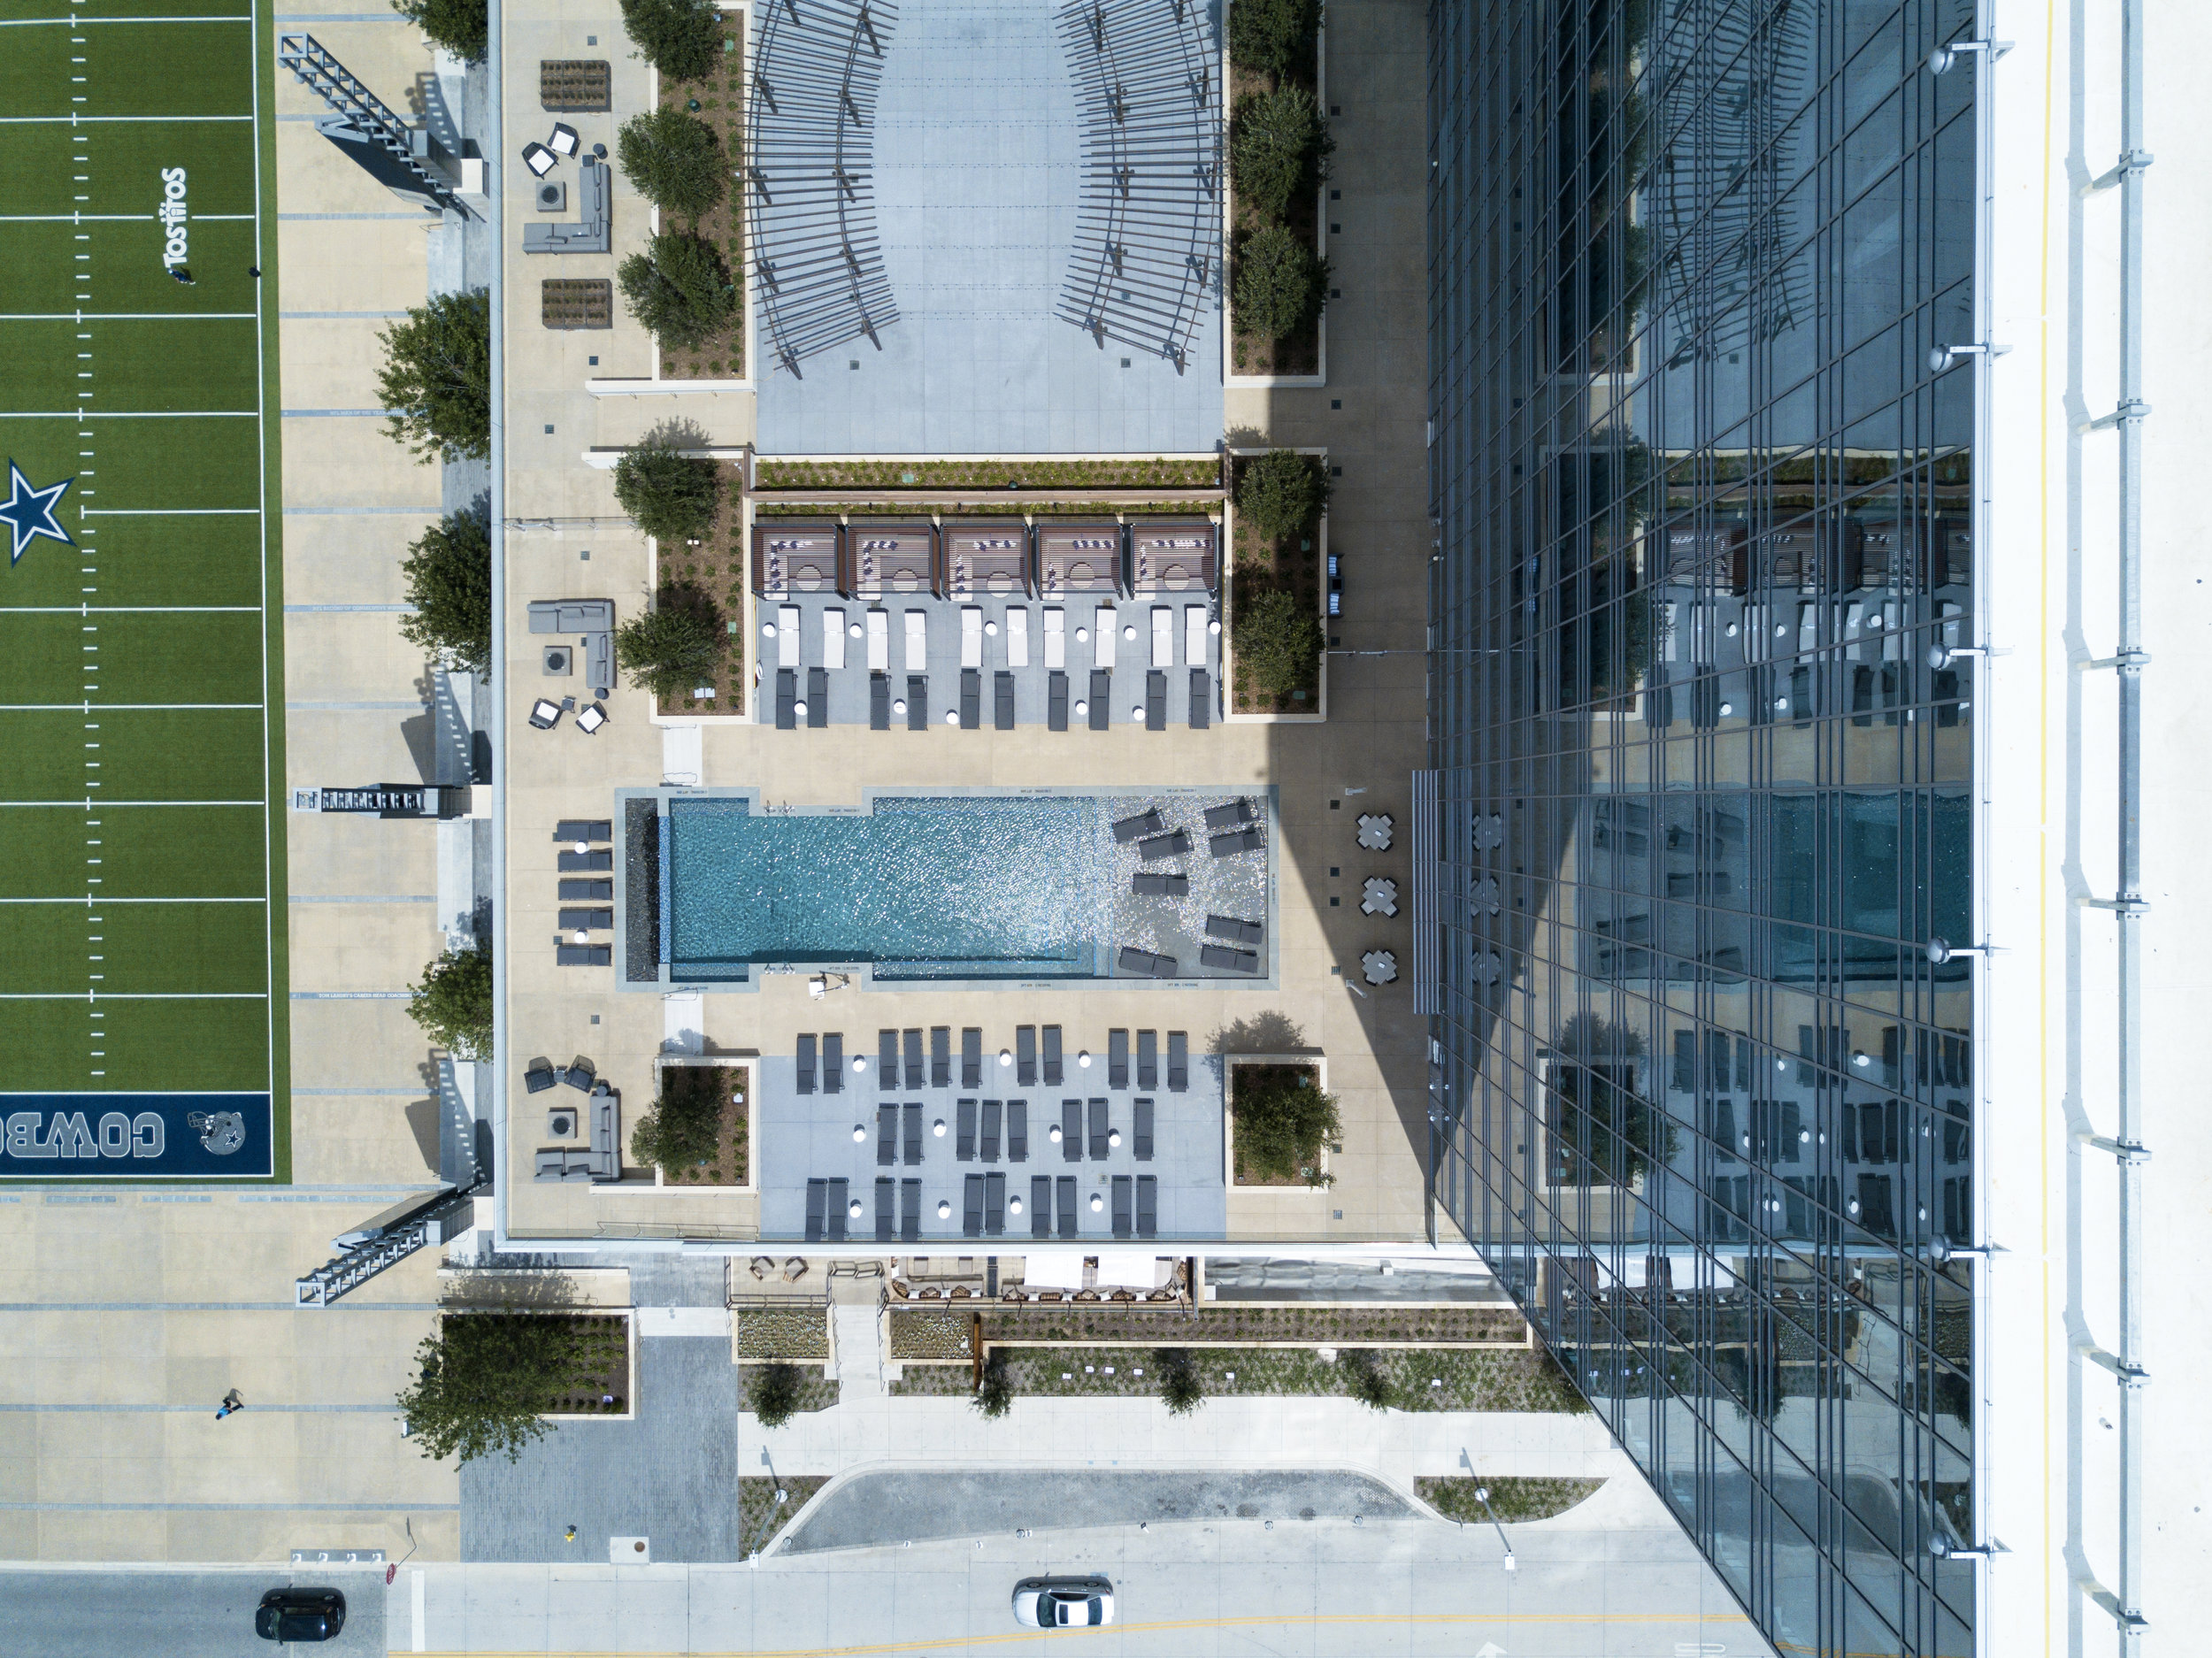 Pool Deck and Plaza_drone photo_Credit Gensler.jpg